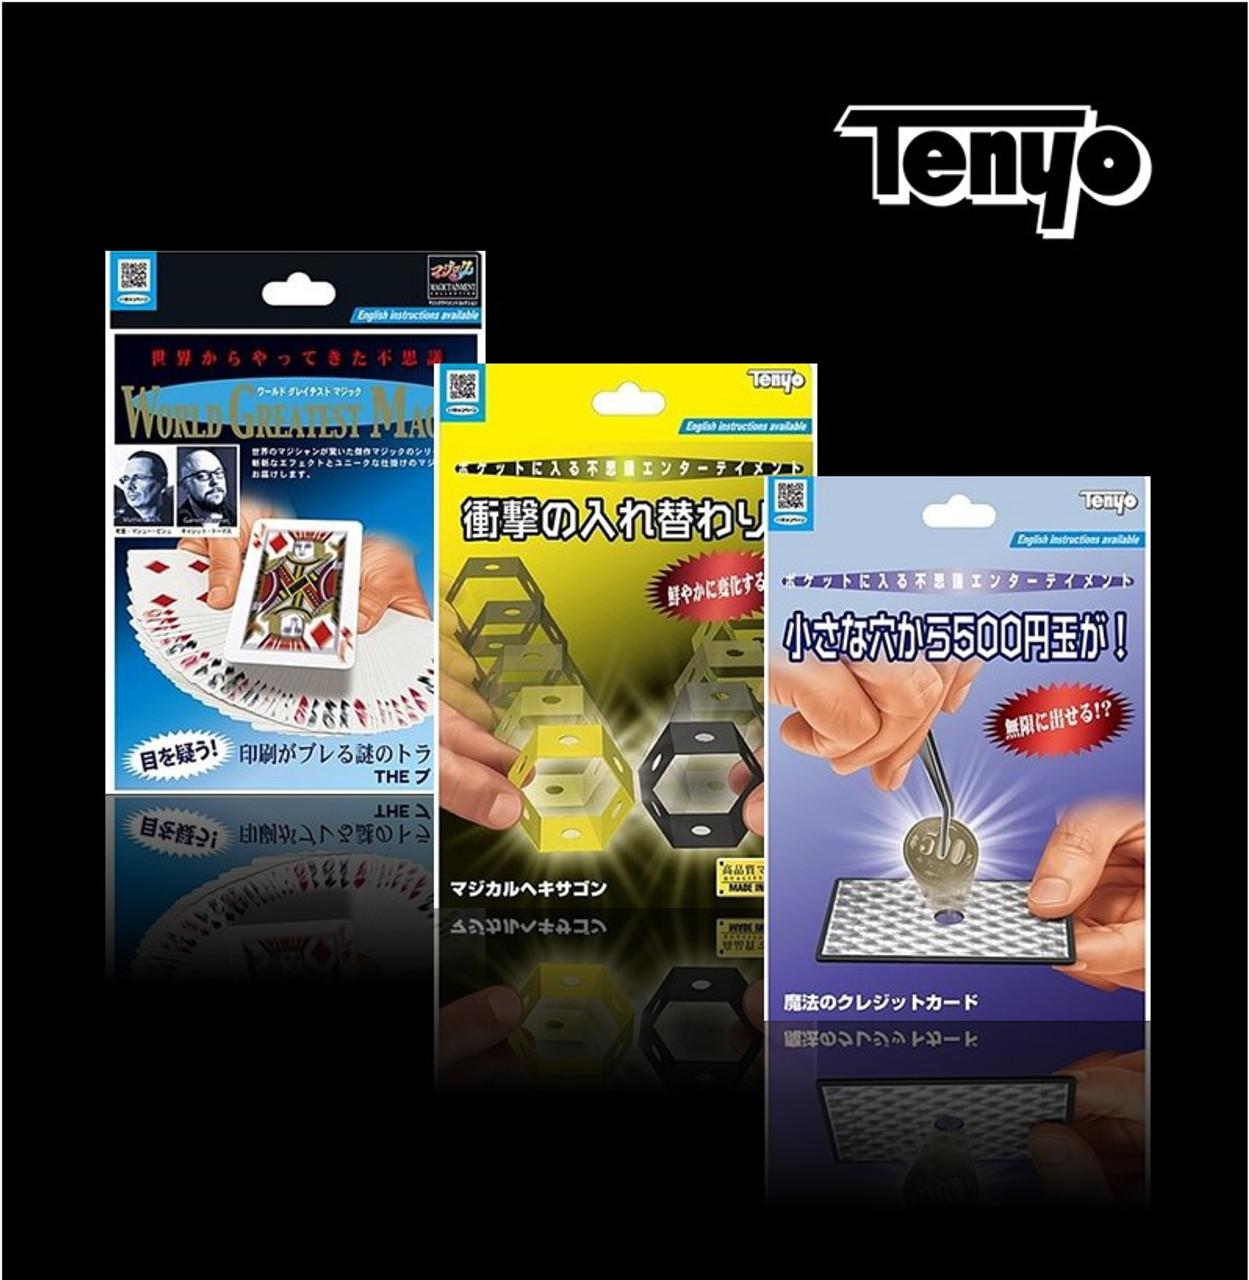 Tenyo 2021 Range - The Blur - Honeycomb - Tweezers Magic Tricks